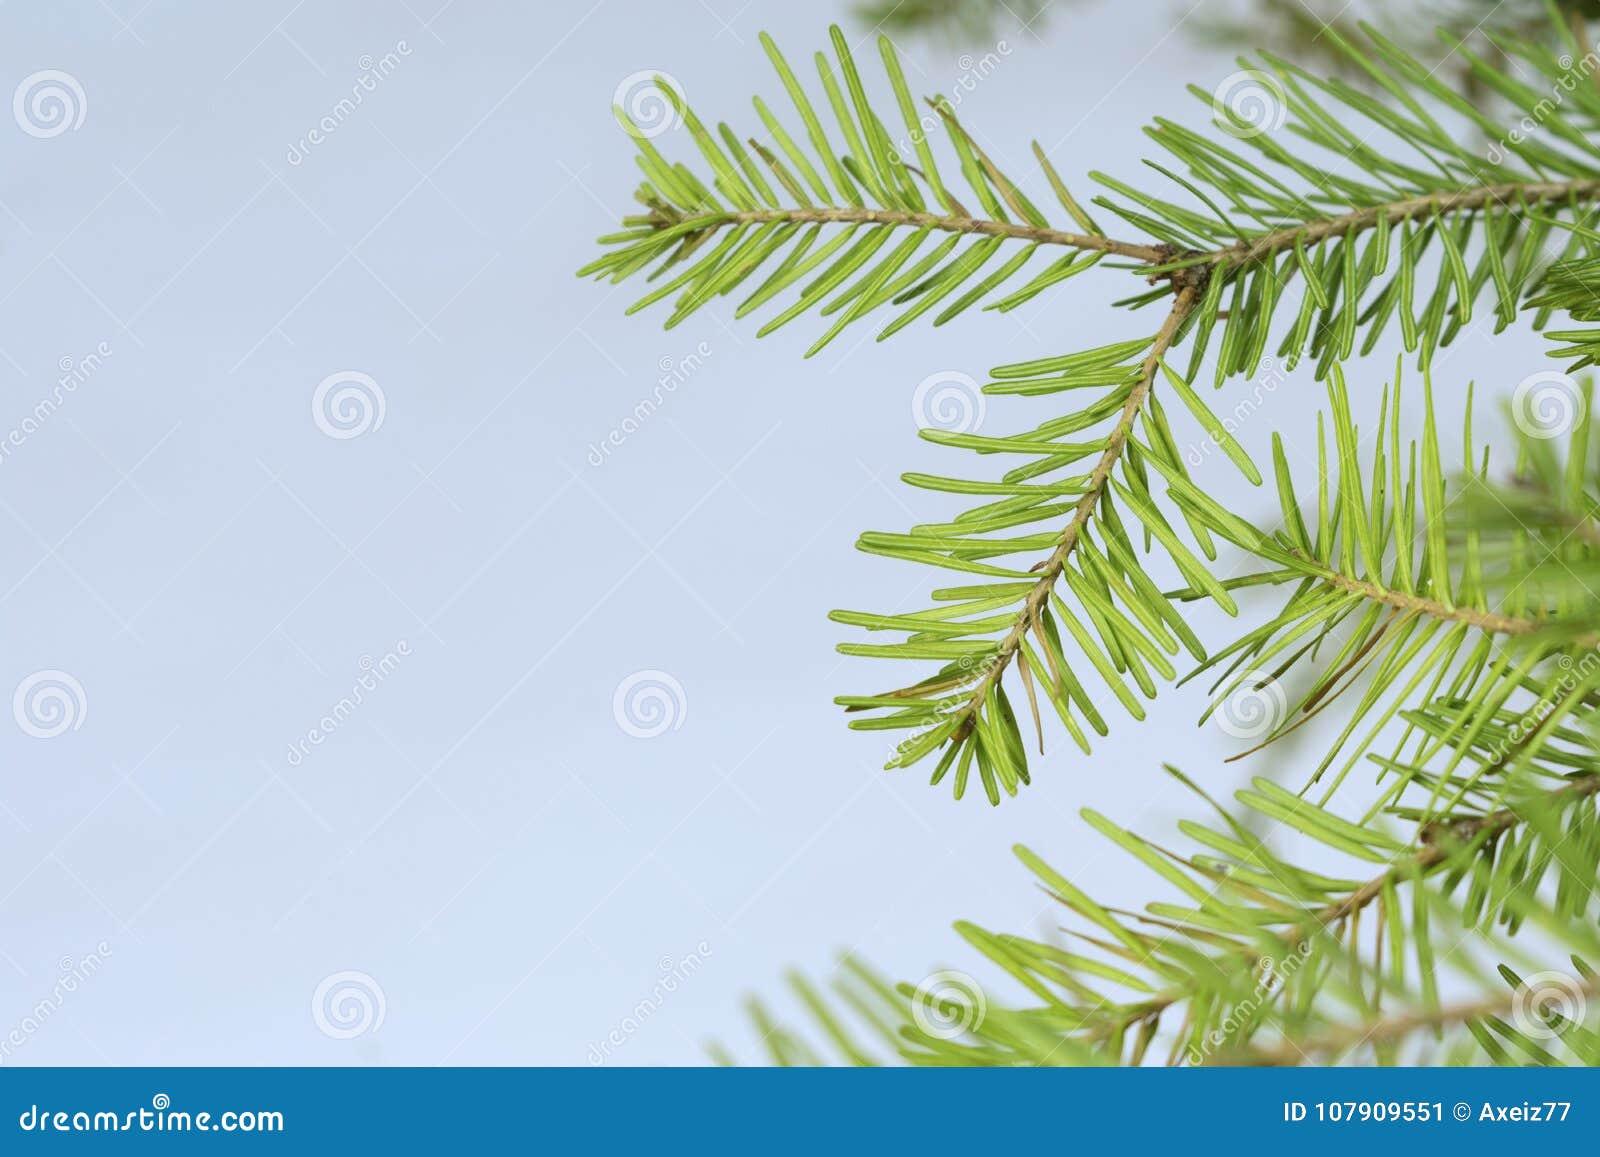 Dream Dream Fir, spruce, what dreams of Fir, spruce in a dream to see 90